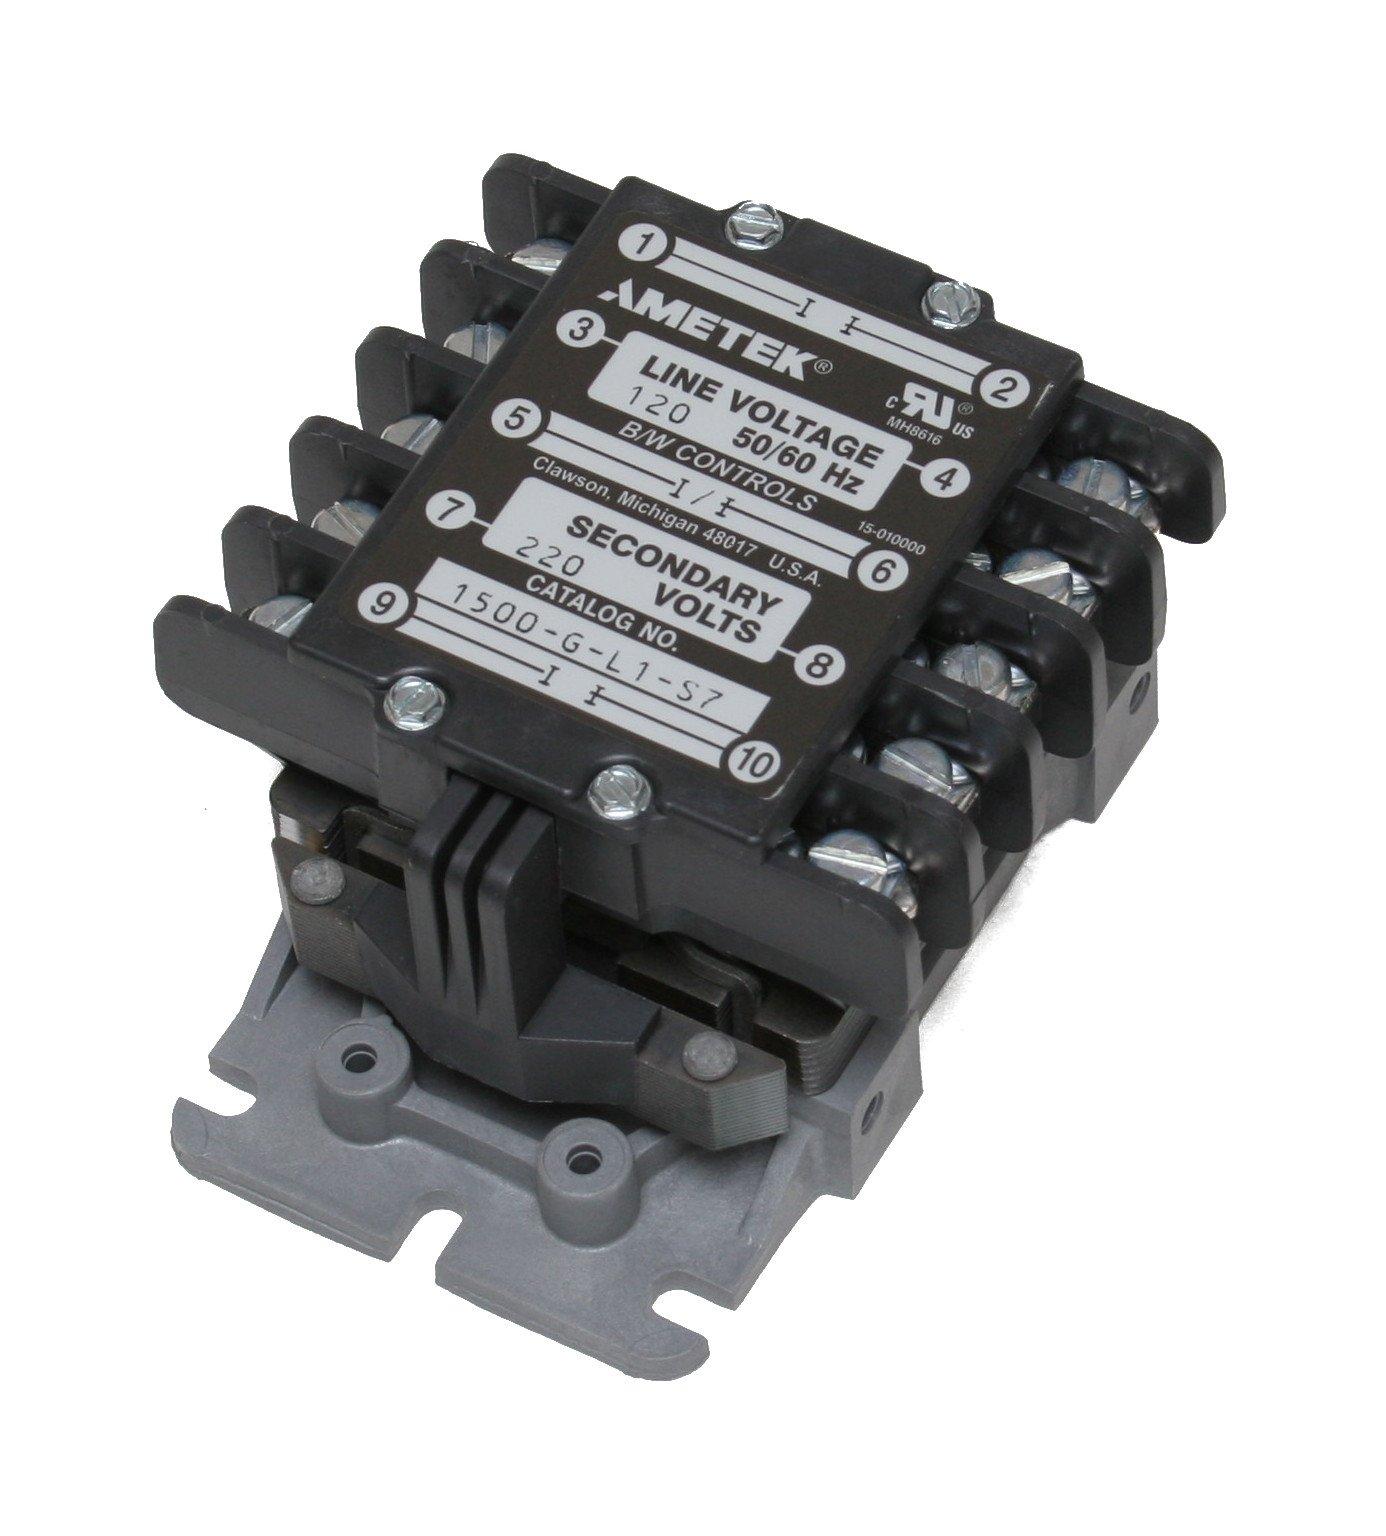 B/W Controls 1500-G-L1-S7 Liquid Level Control Relay